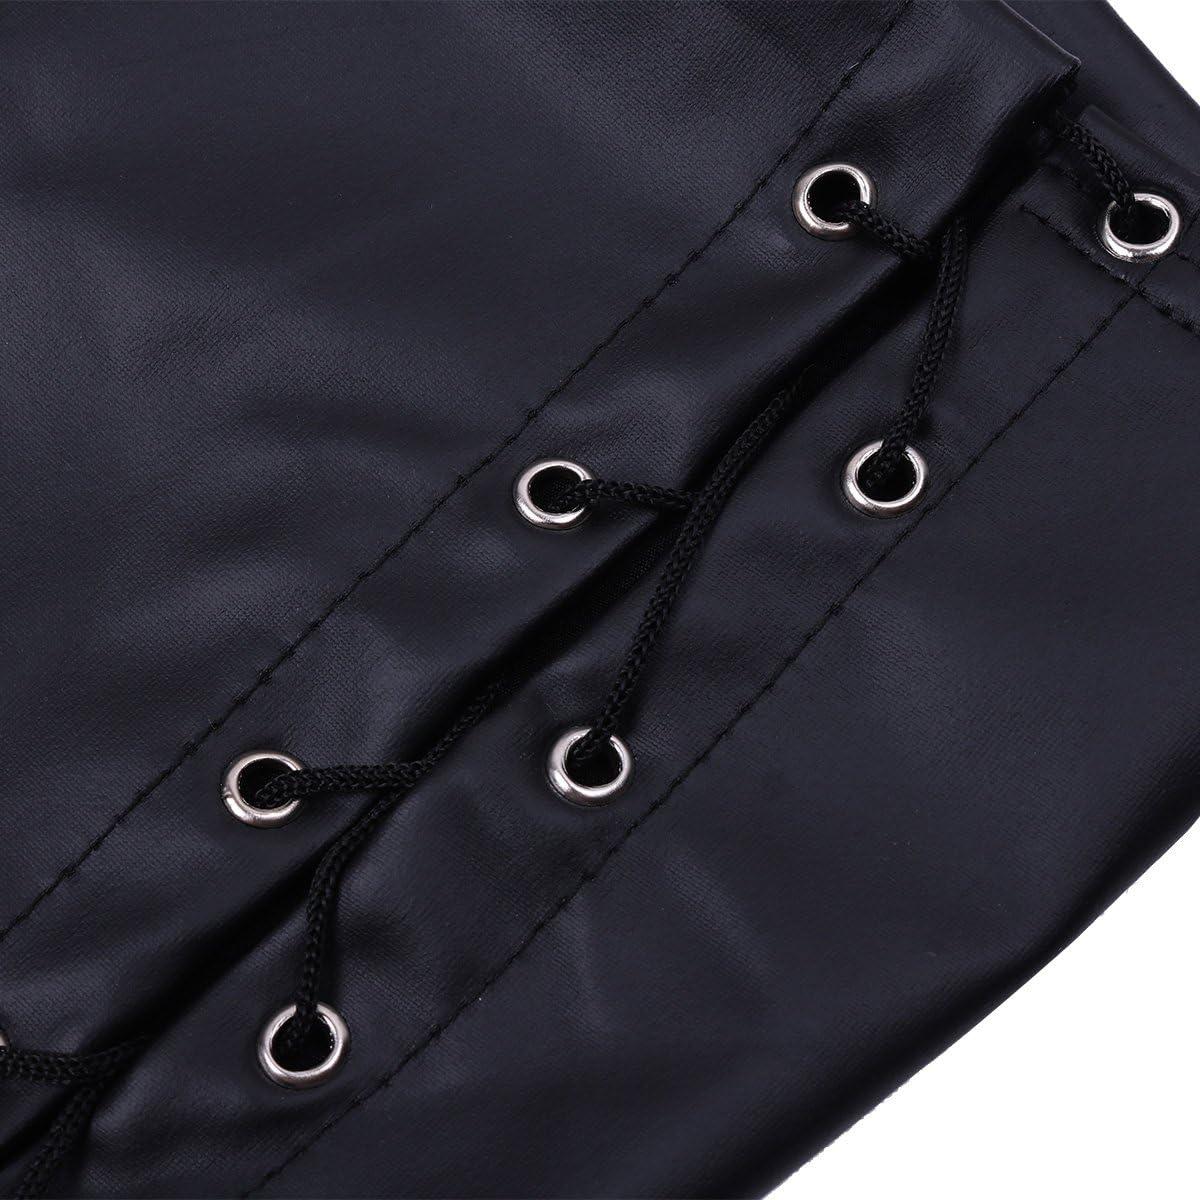 Freebily Womens Shiny Metallic Lace Up Hot Shorts Sissy Panties Bikini Brief Underwear Clubwear